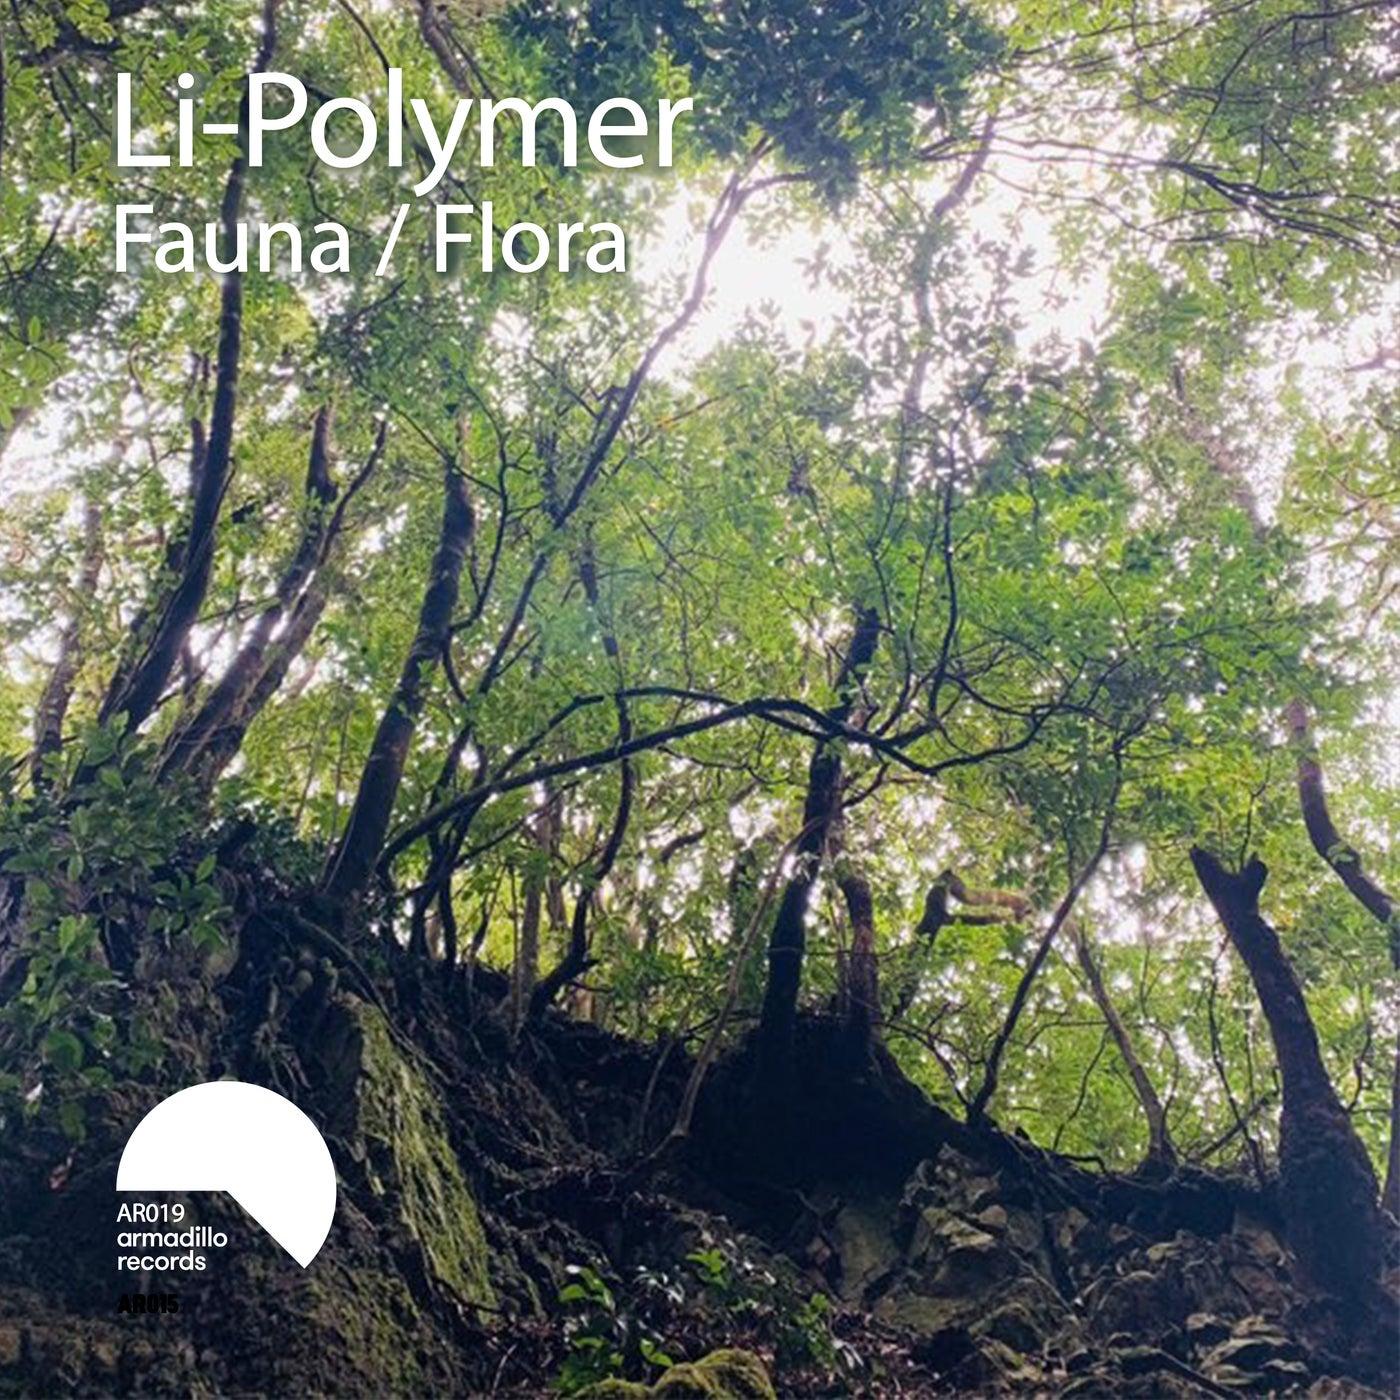 Flora (Original Mix)